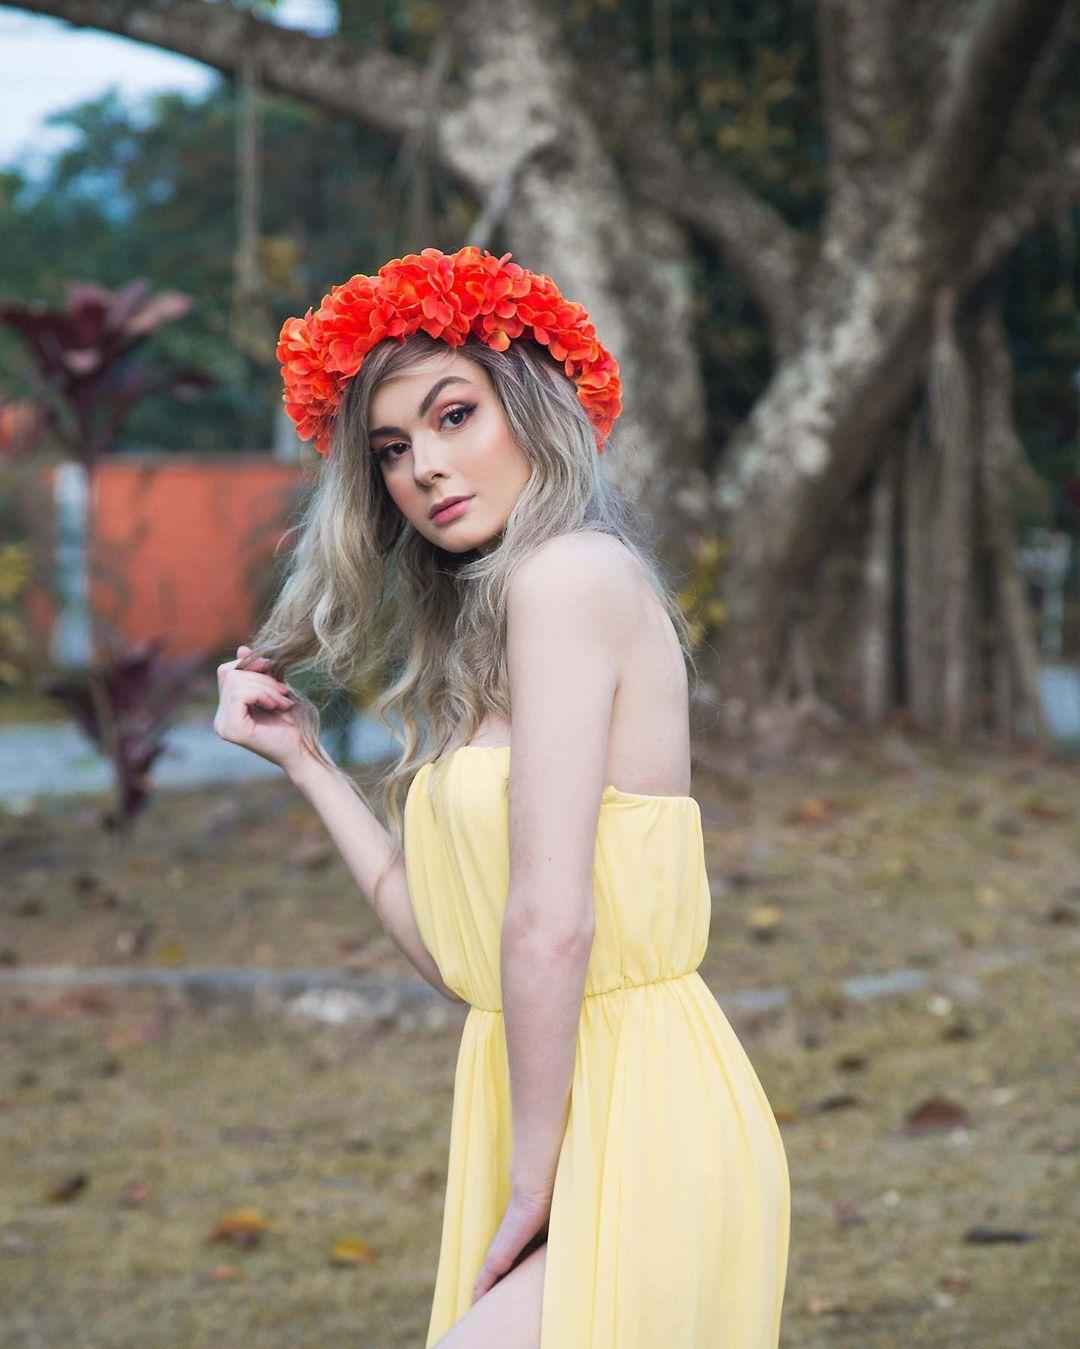 thais bonome, miss beleza da grande sao paulo 2020/miss abcd mundo 2019. 12626222